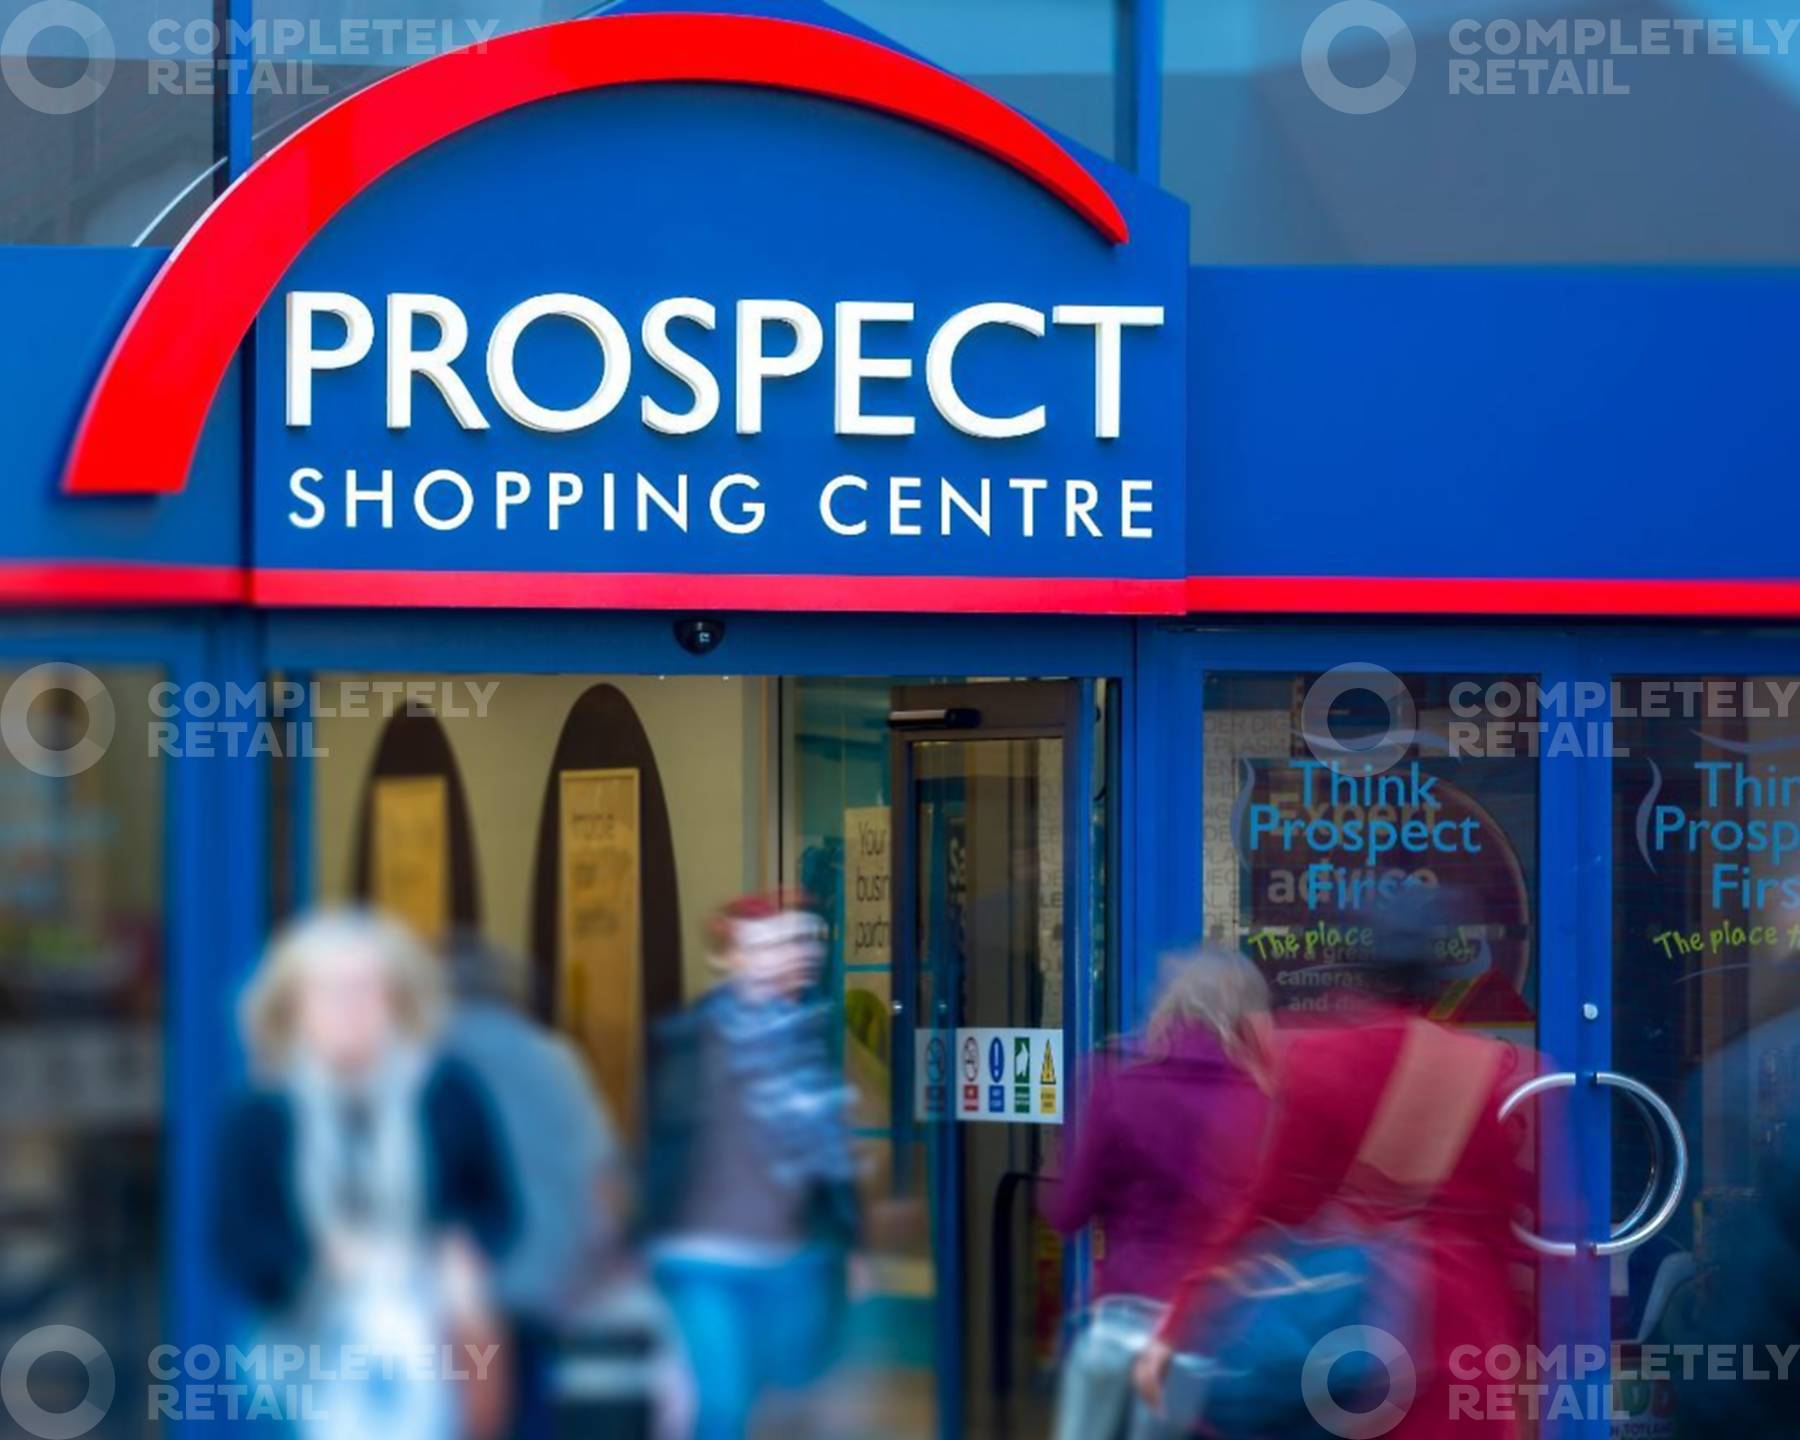 The Prospect Centre